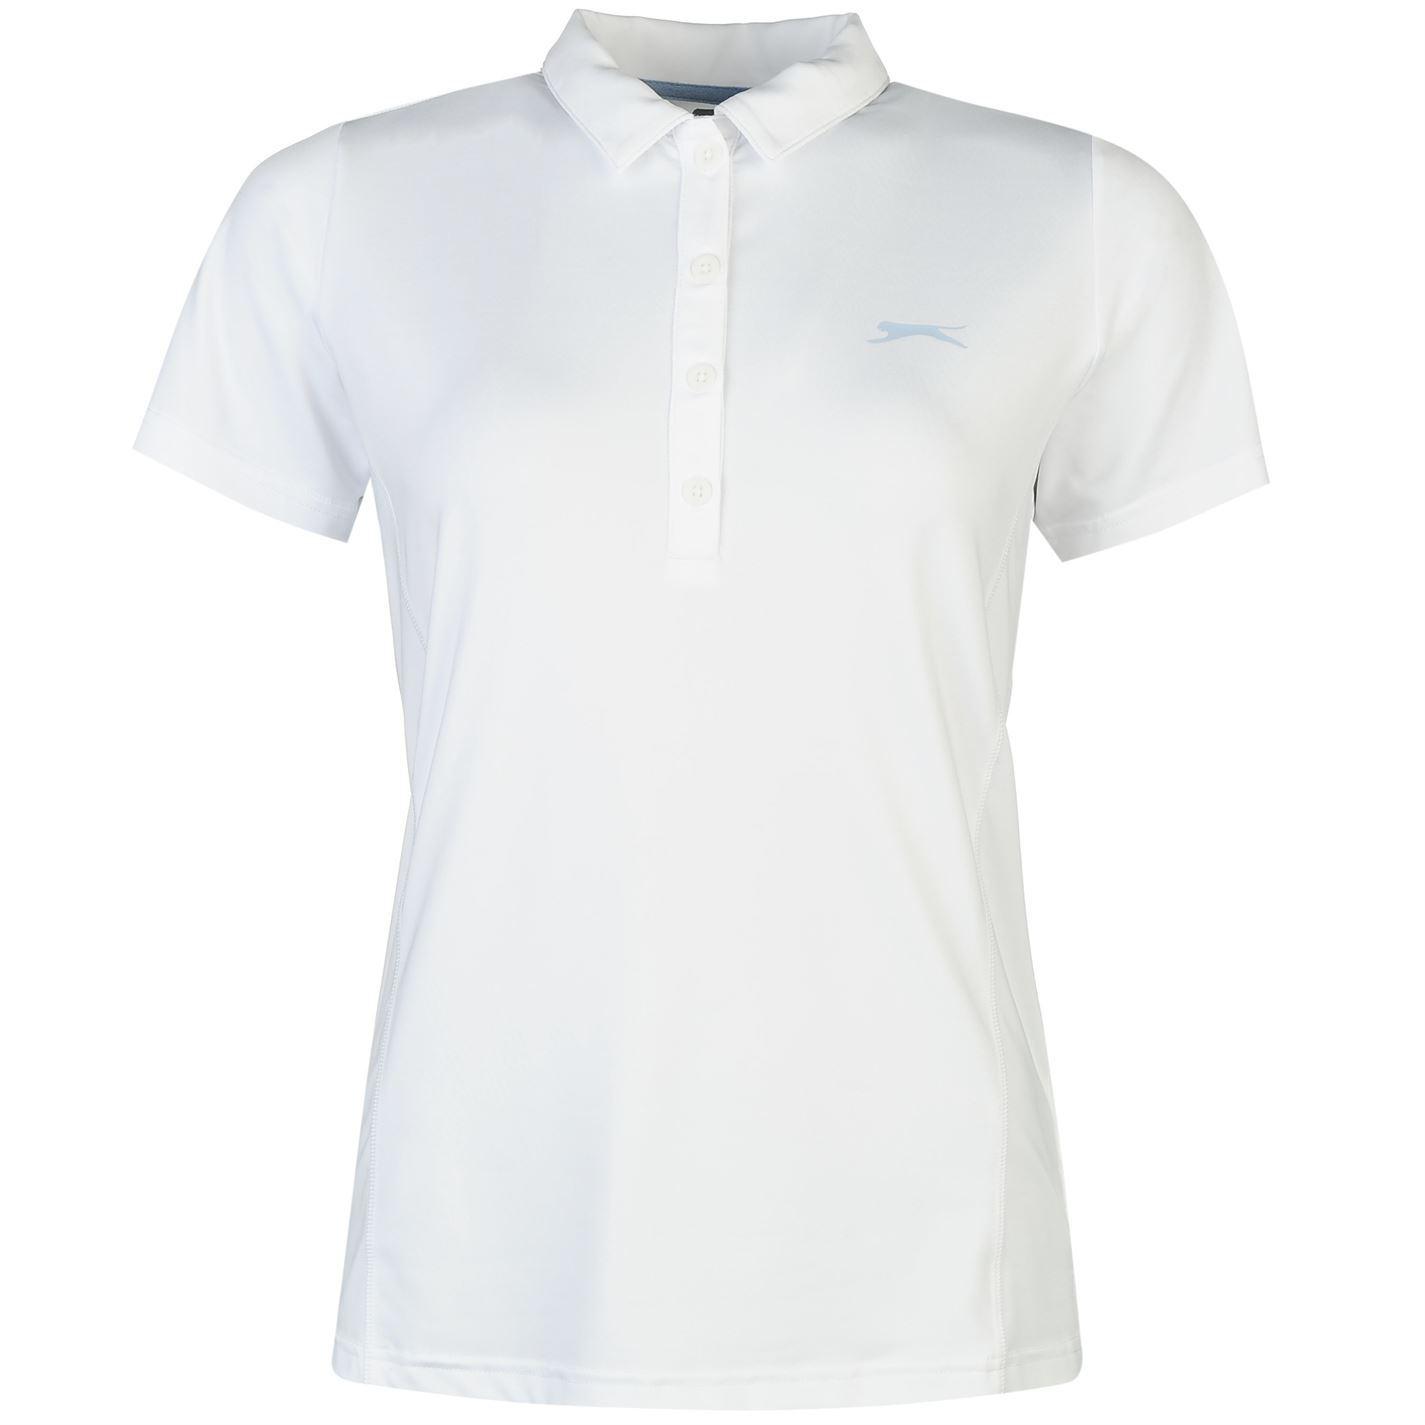 bed4cbff Details about Slazenger Womens Plain Golf Polo Tee Shirt Top Short Sleeve  Fold Down Collar